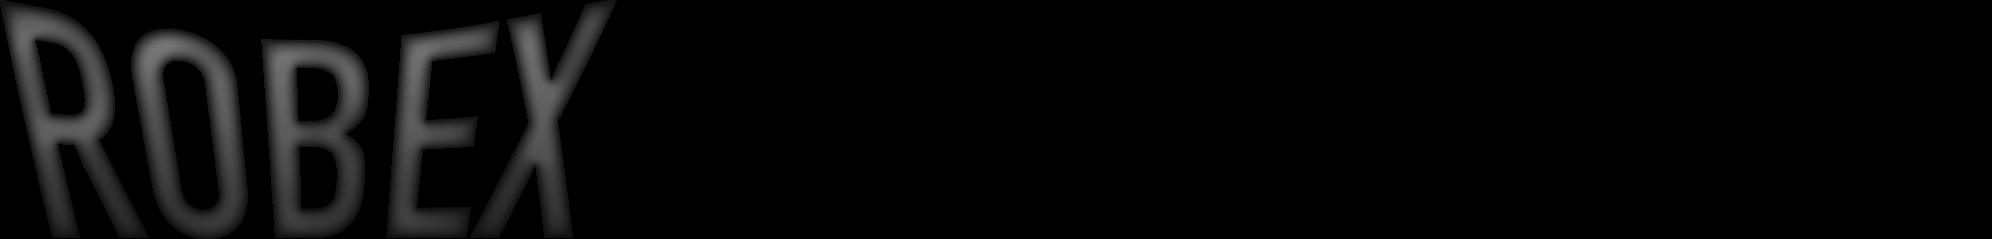 ROBEXmodels